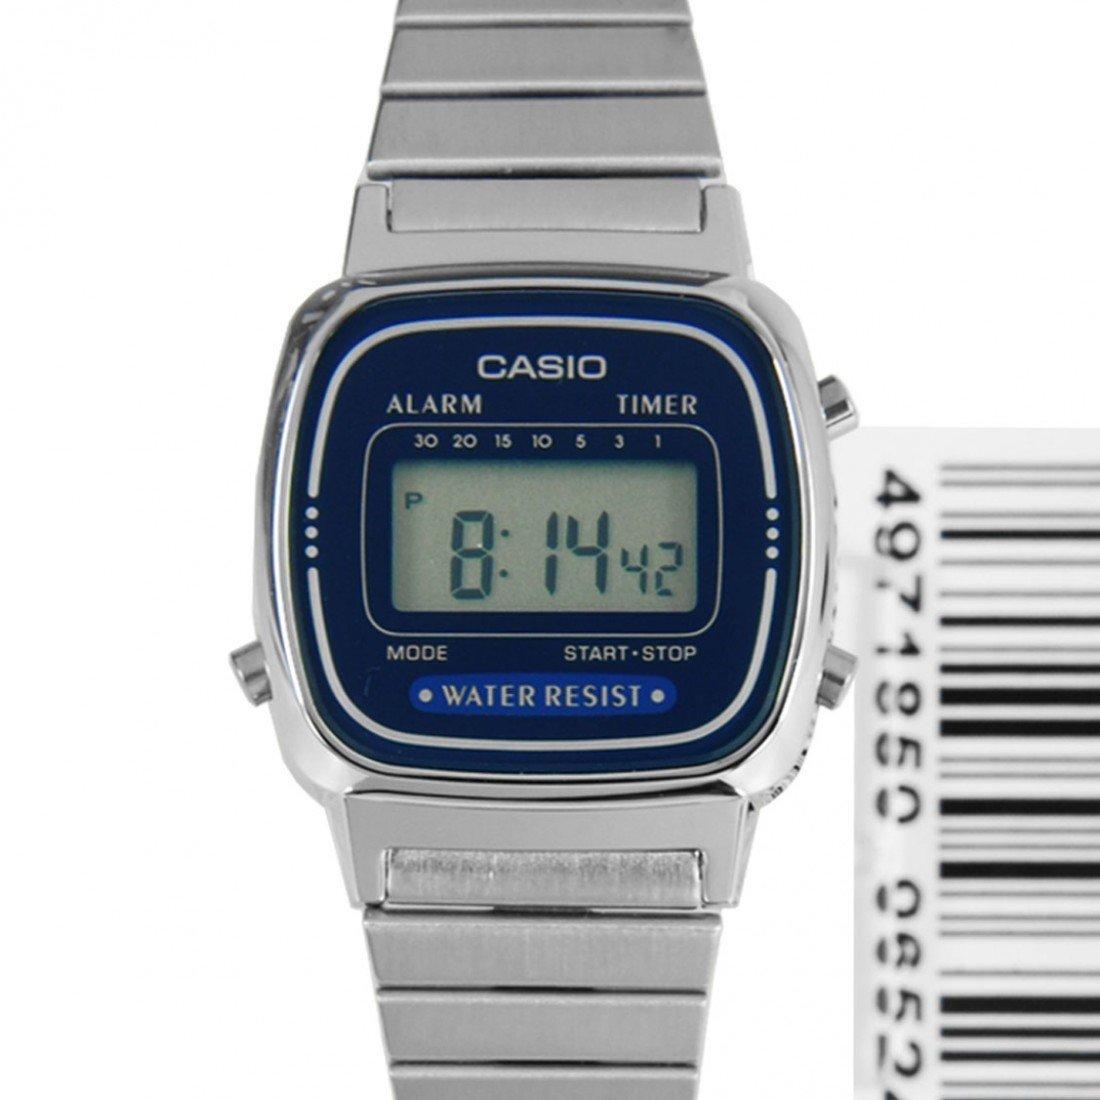 Reloj casio collection LA670WA-2dF cronografo multifuncional - acero inoxidable - water resist